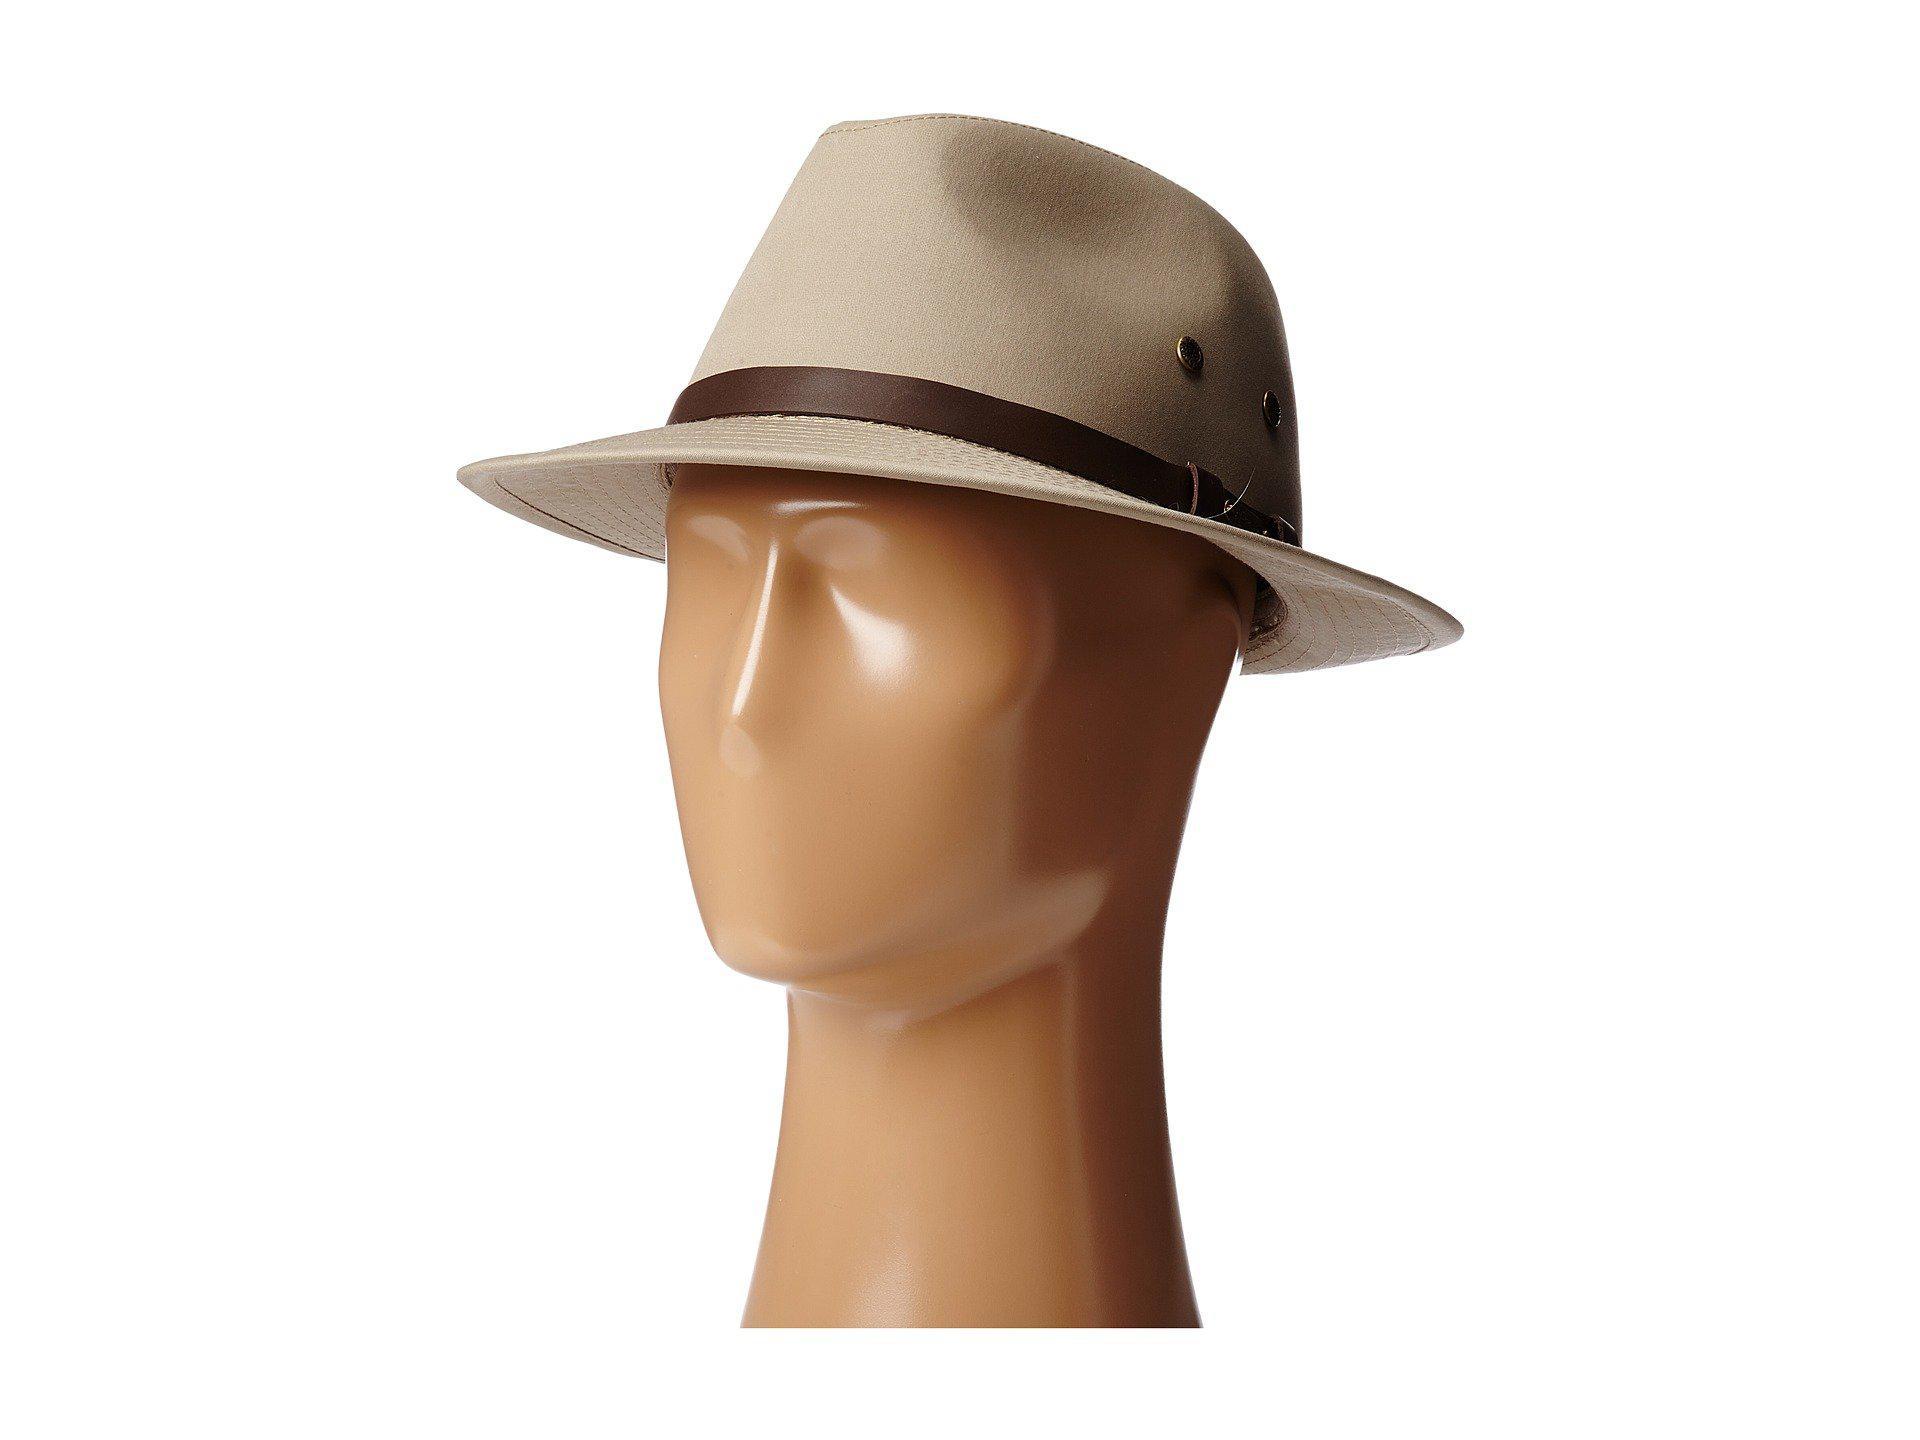 Lyst - Stetson Gable Rain Safari (khaki) Caps in Natural for Men 3c460b315a7